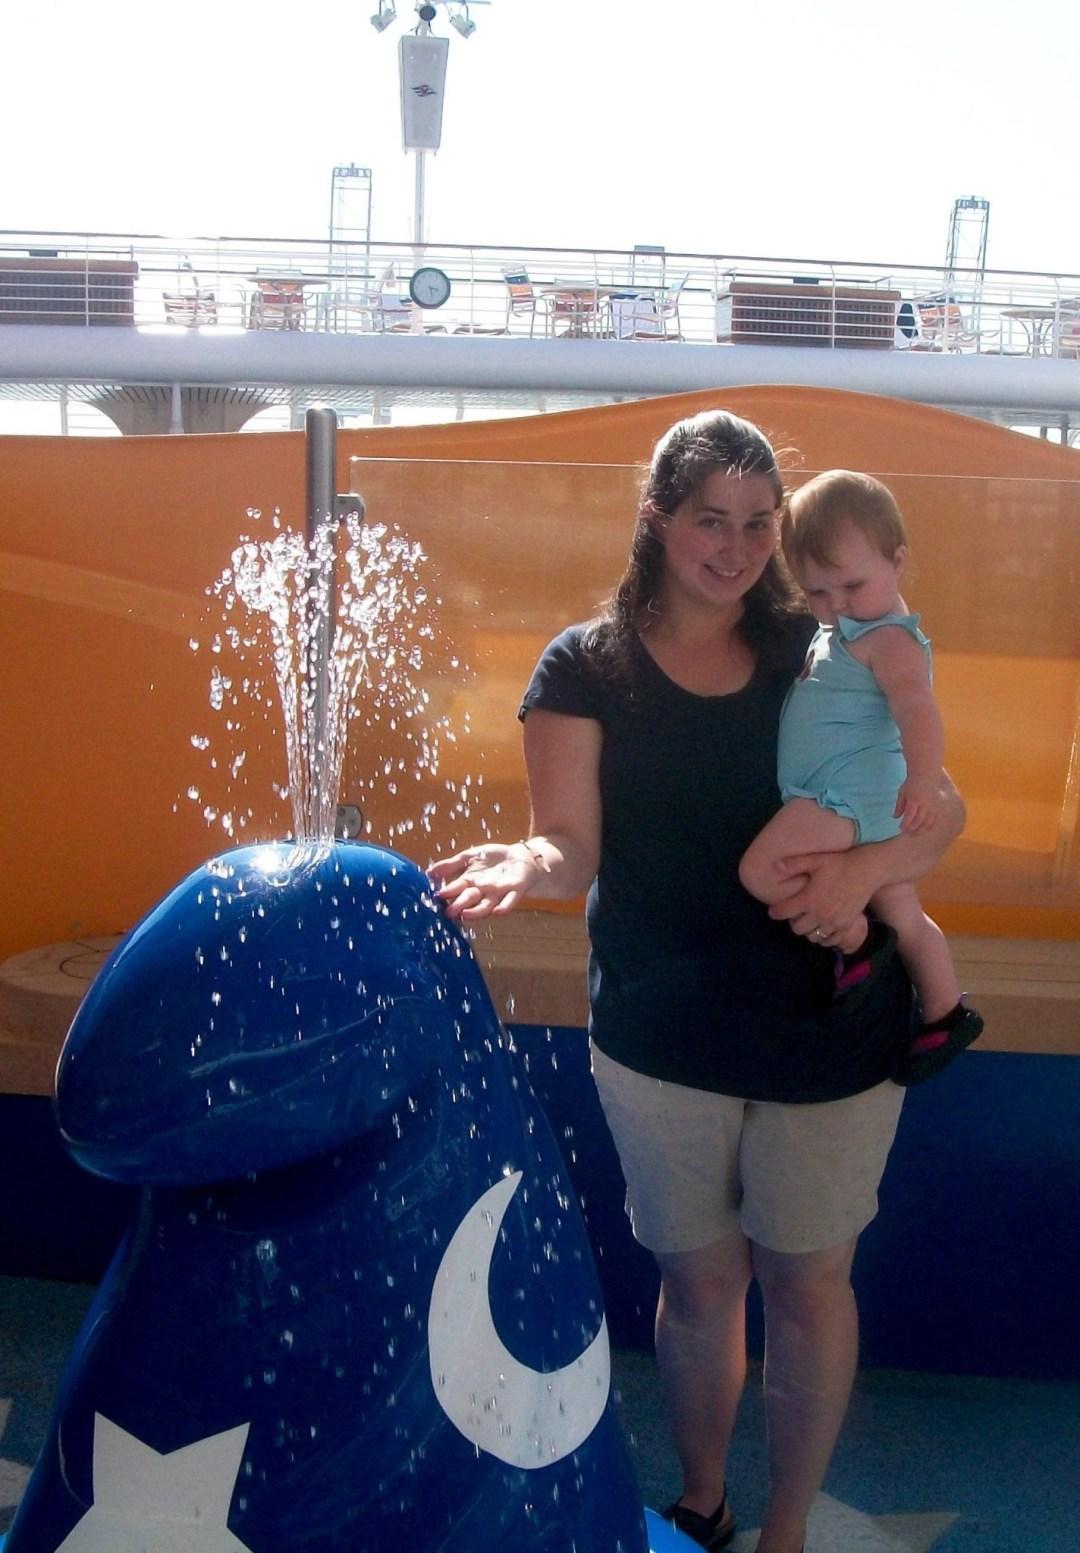 DisneyTrip2011-413